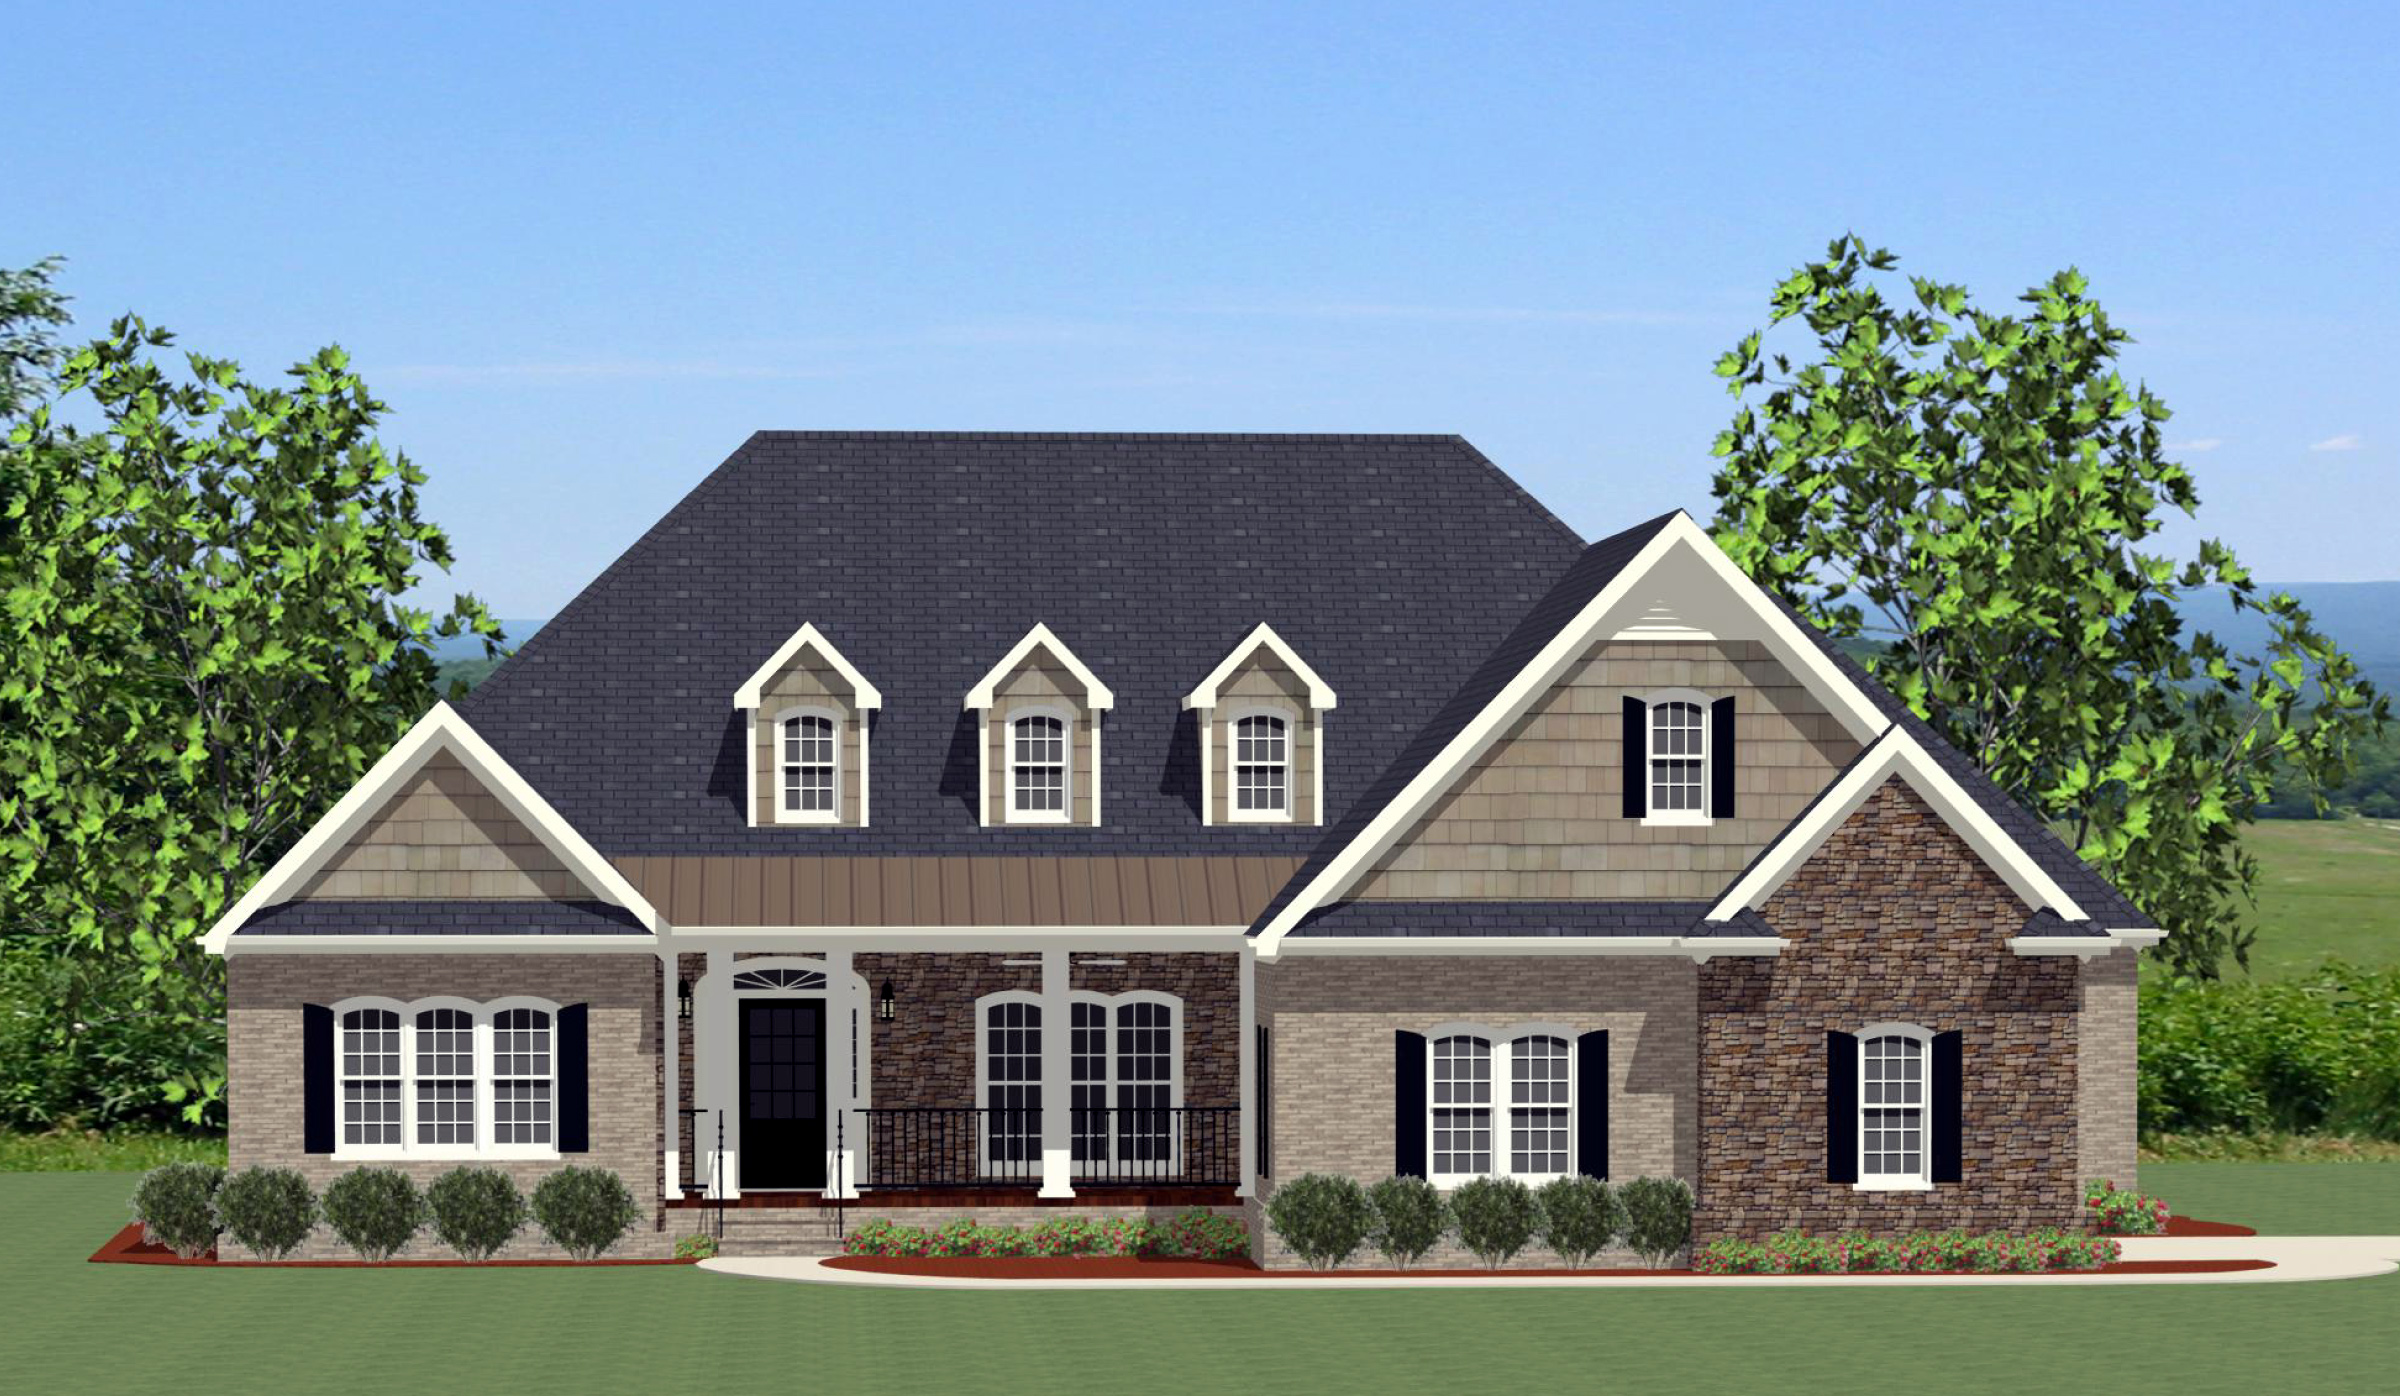 Split Bedroom House Plan With Bonus Room 46221la